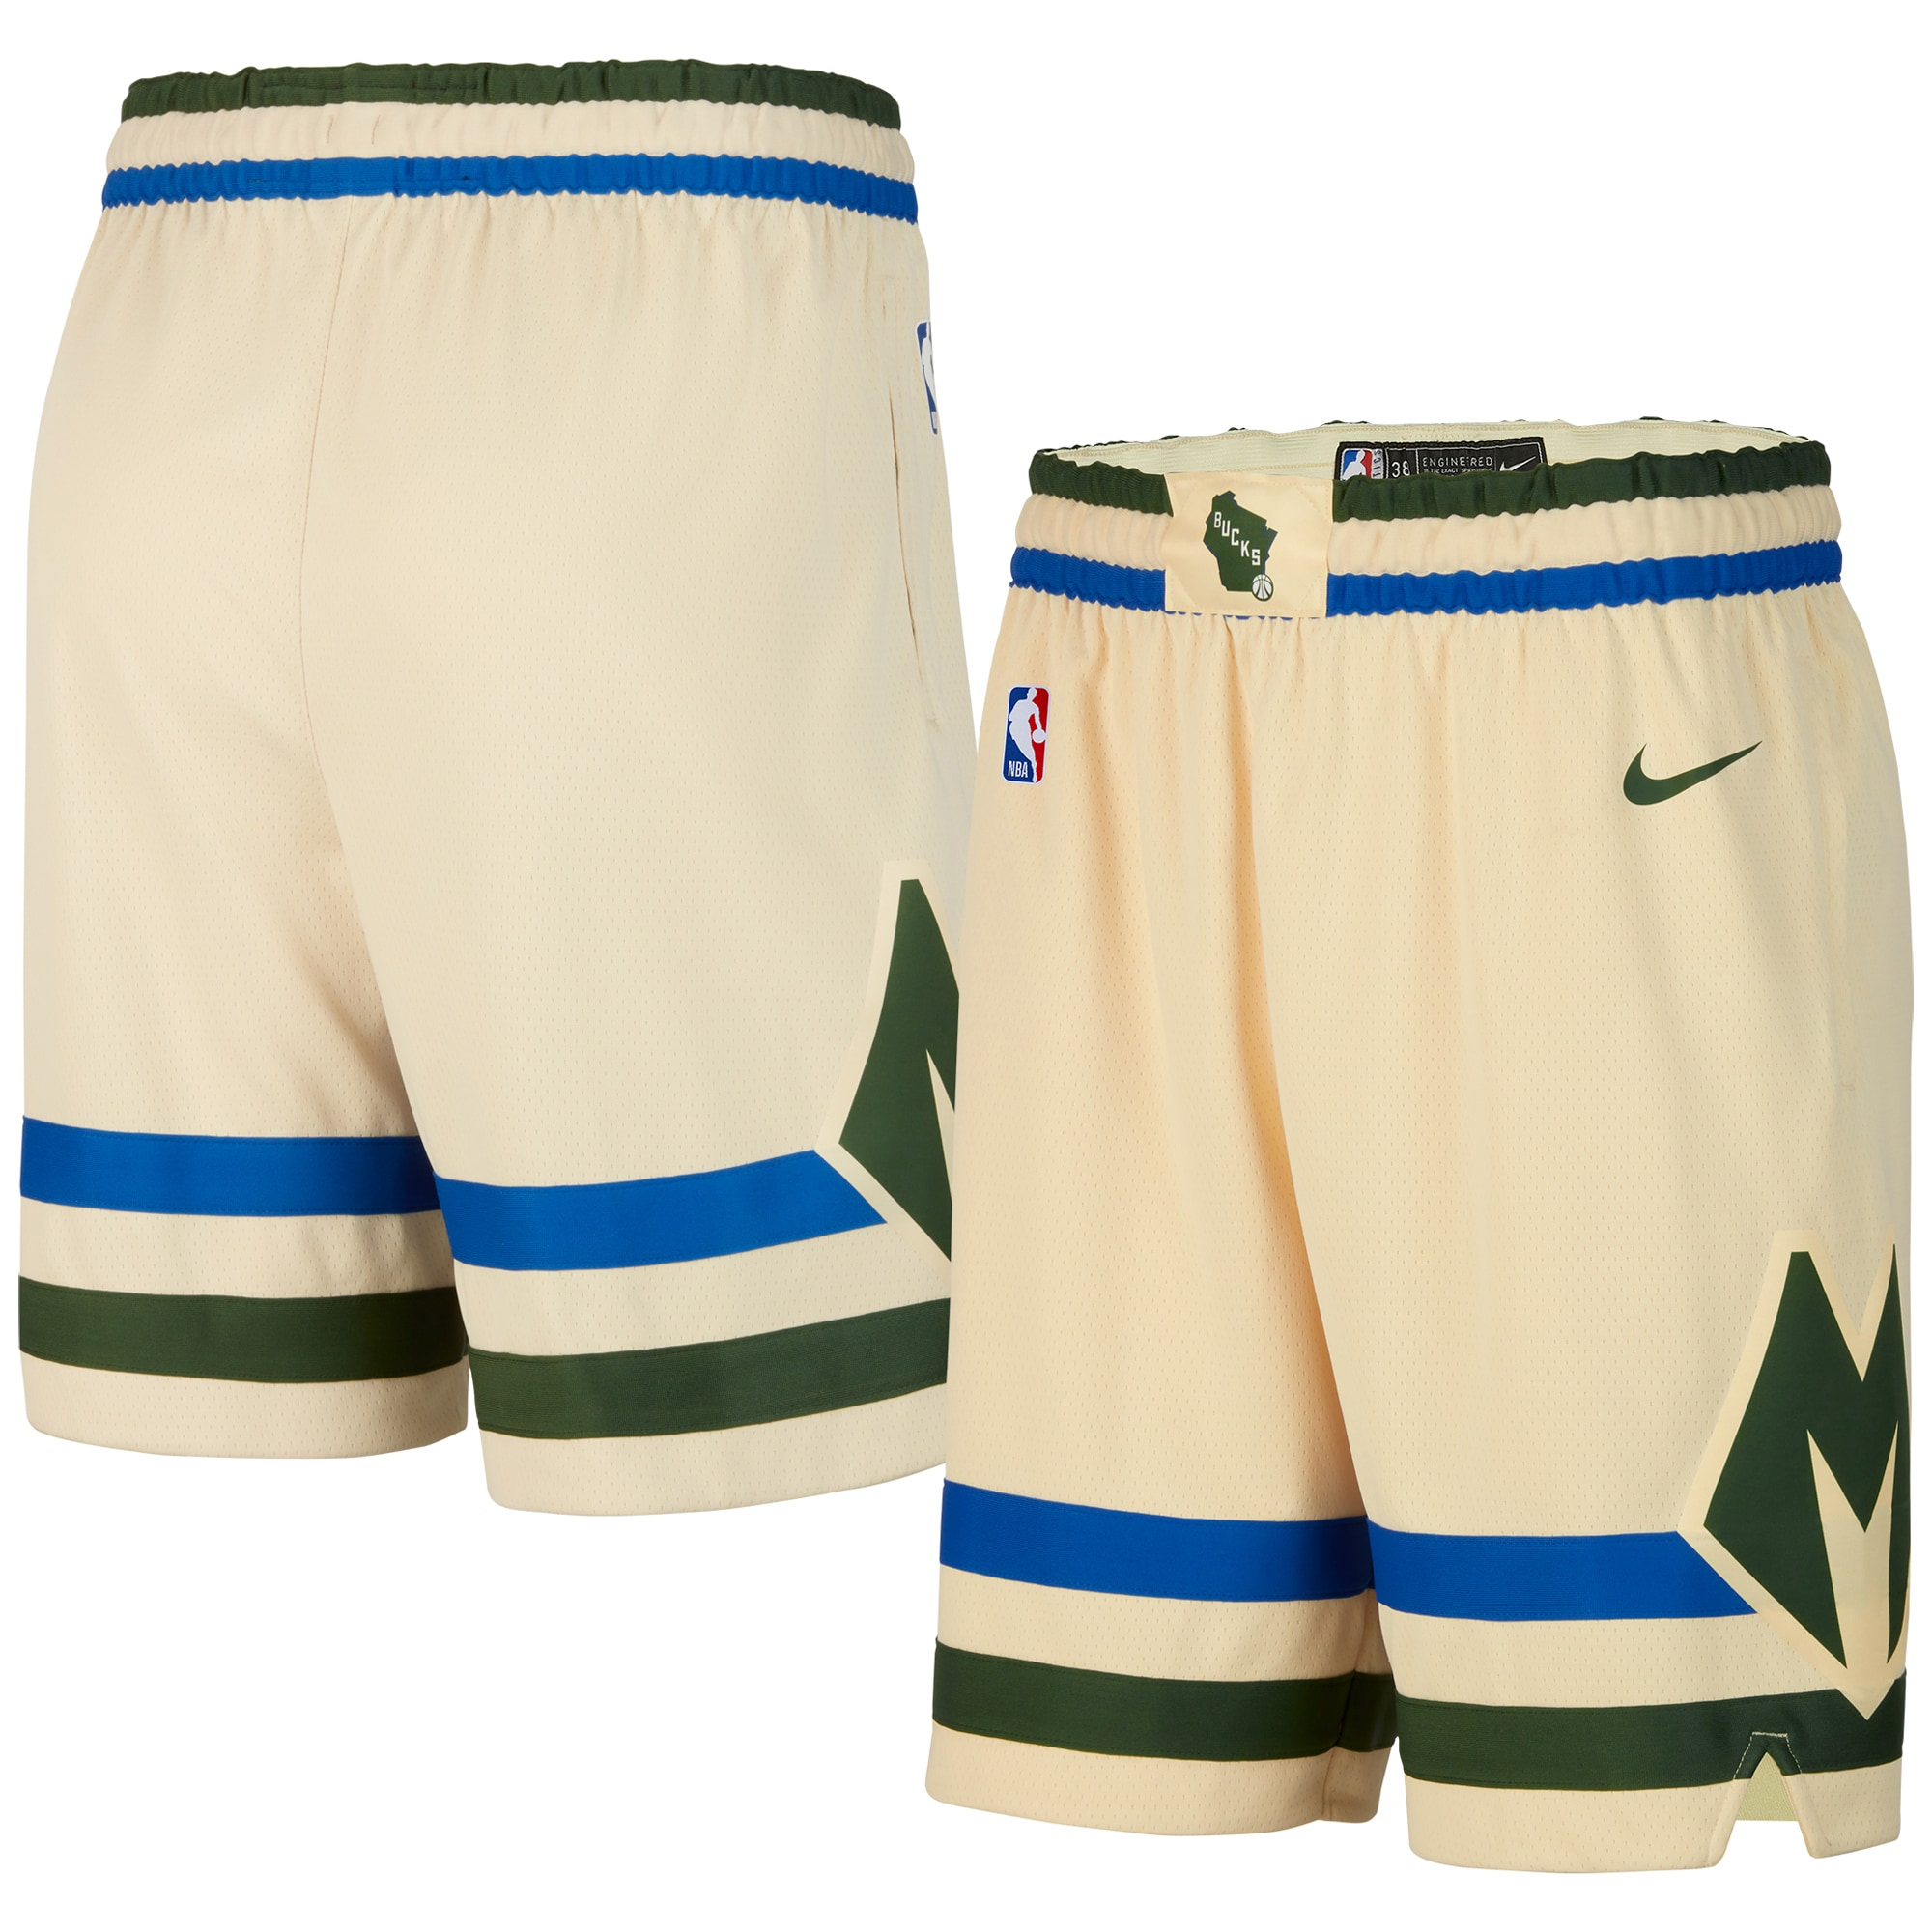 Milwaukee Bucks Nike 2019/20 City Edition Swingman Shorts - Cream